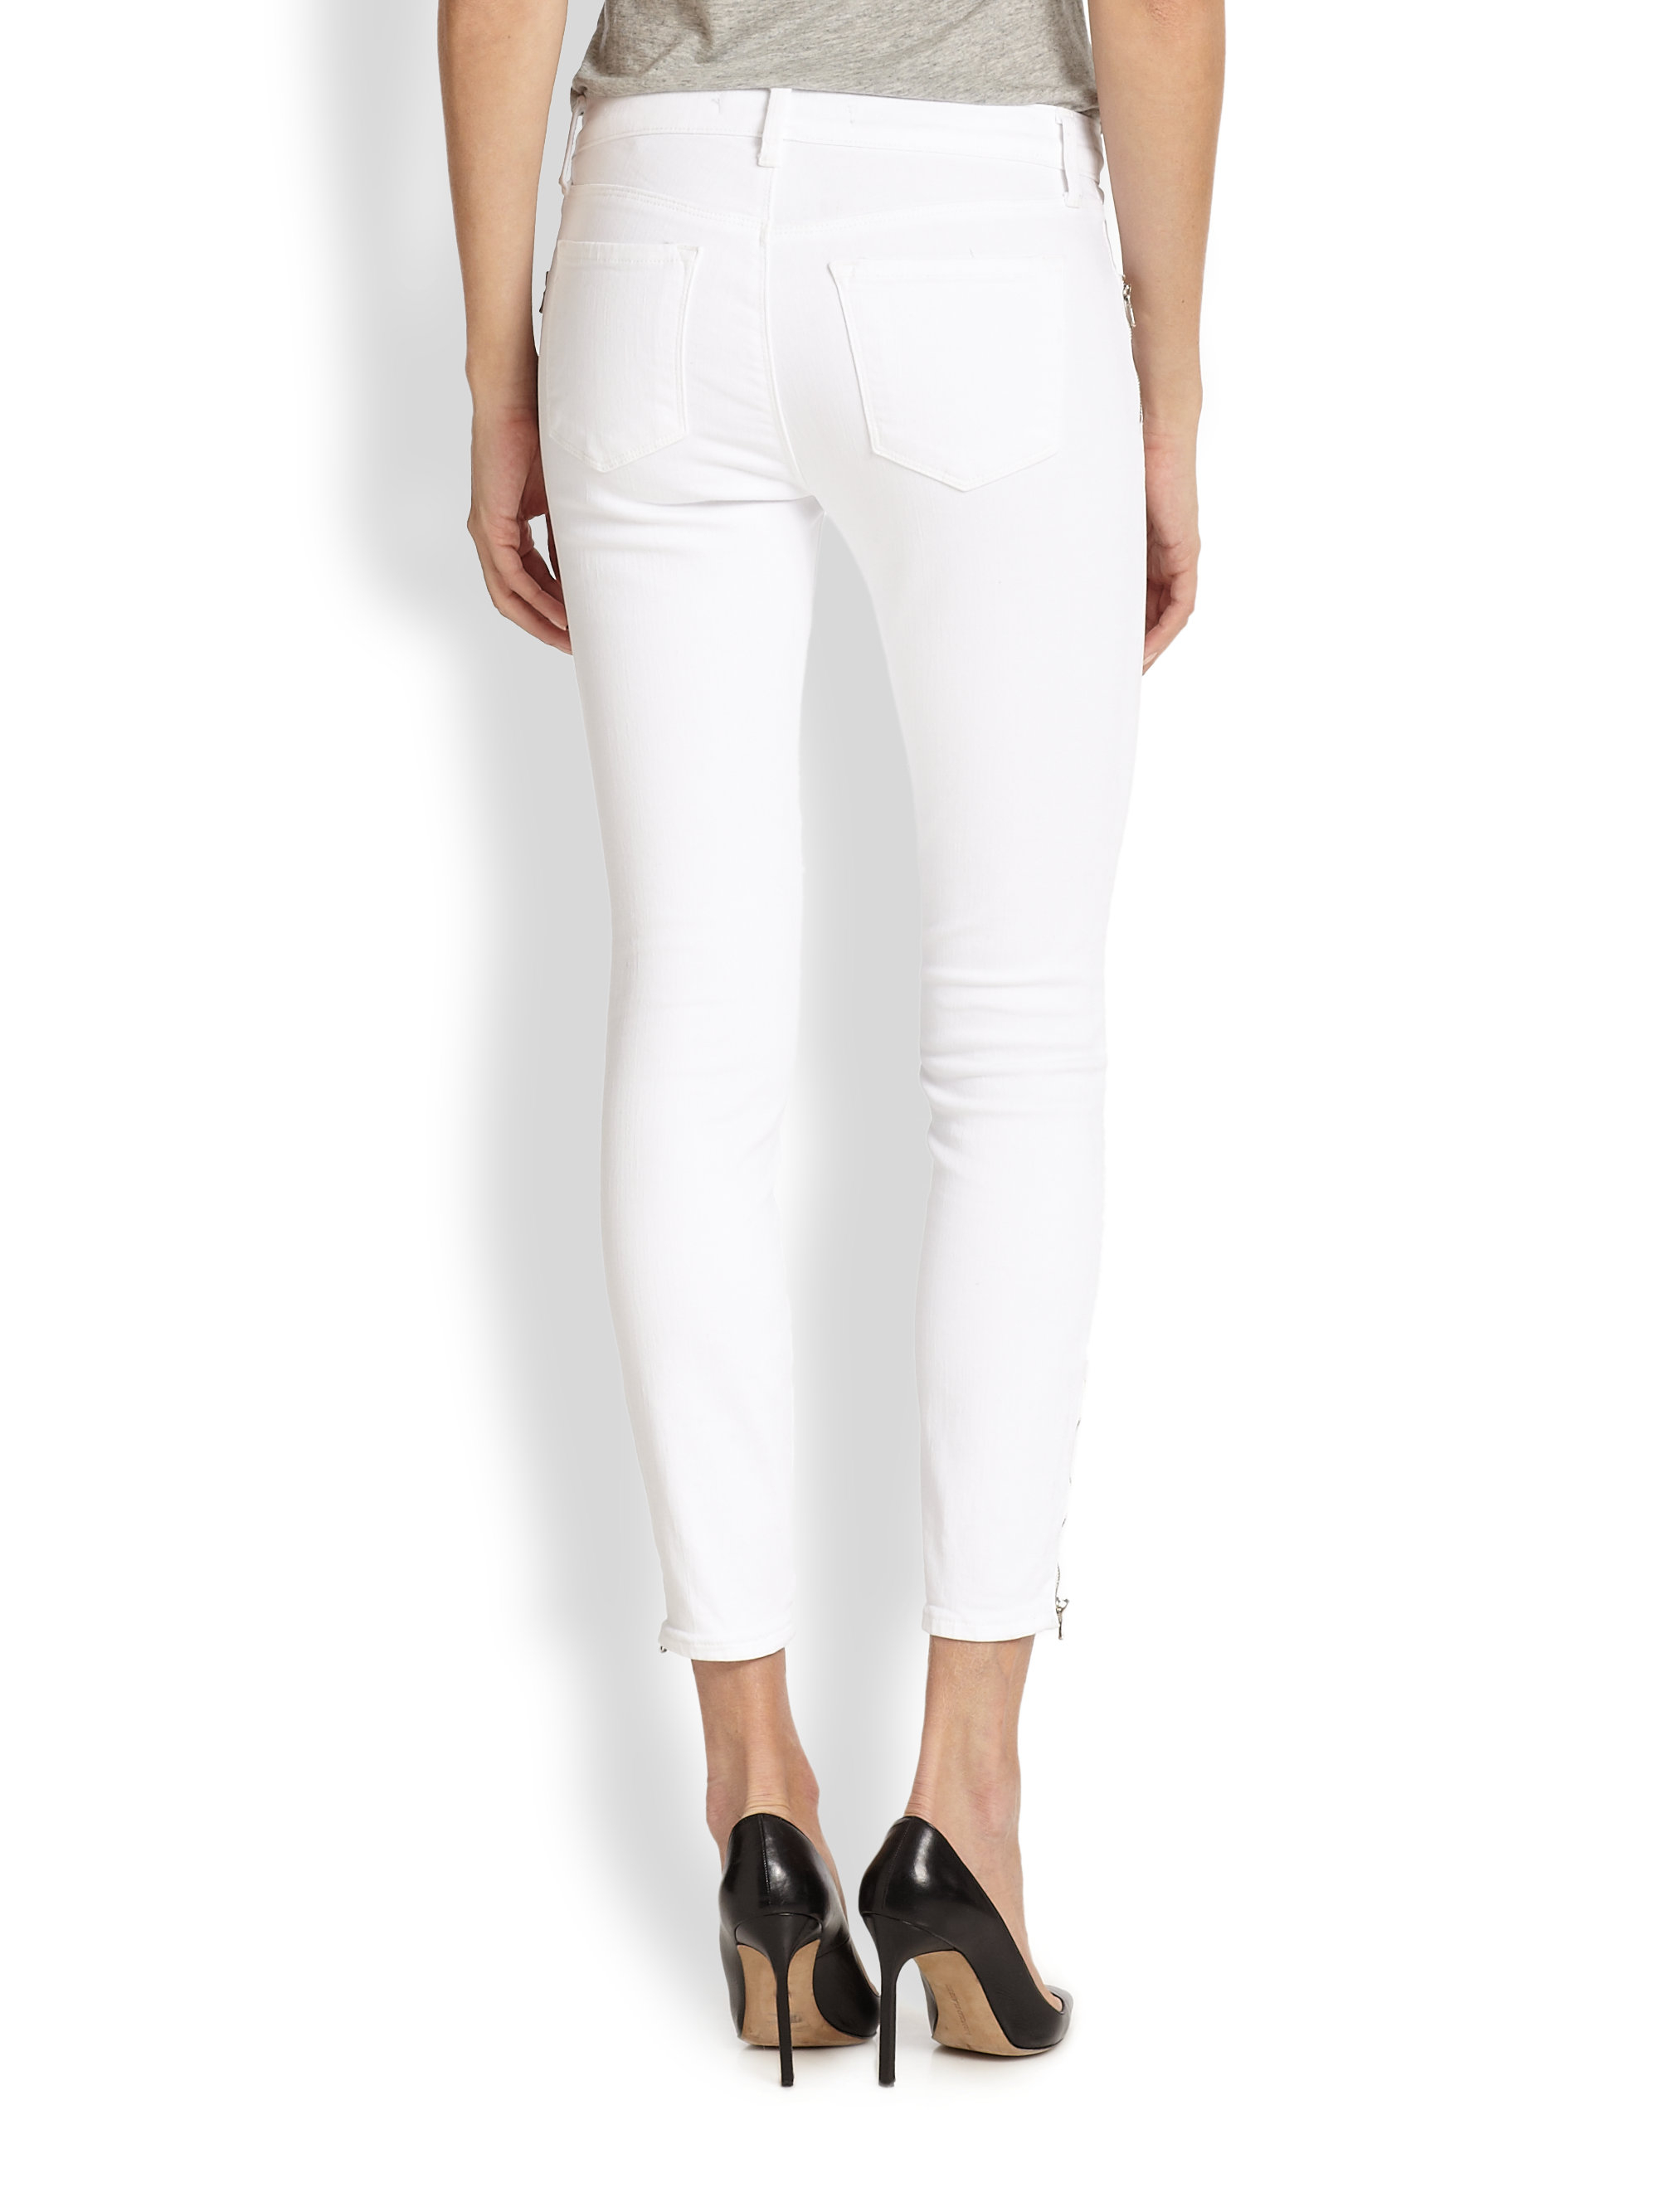 J brand Tali Zip-Detail Cropped Skinny Jeans in White | Lyst